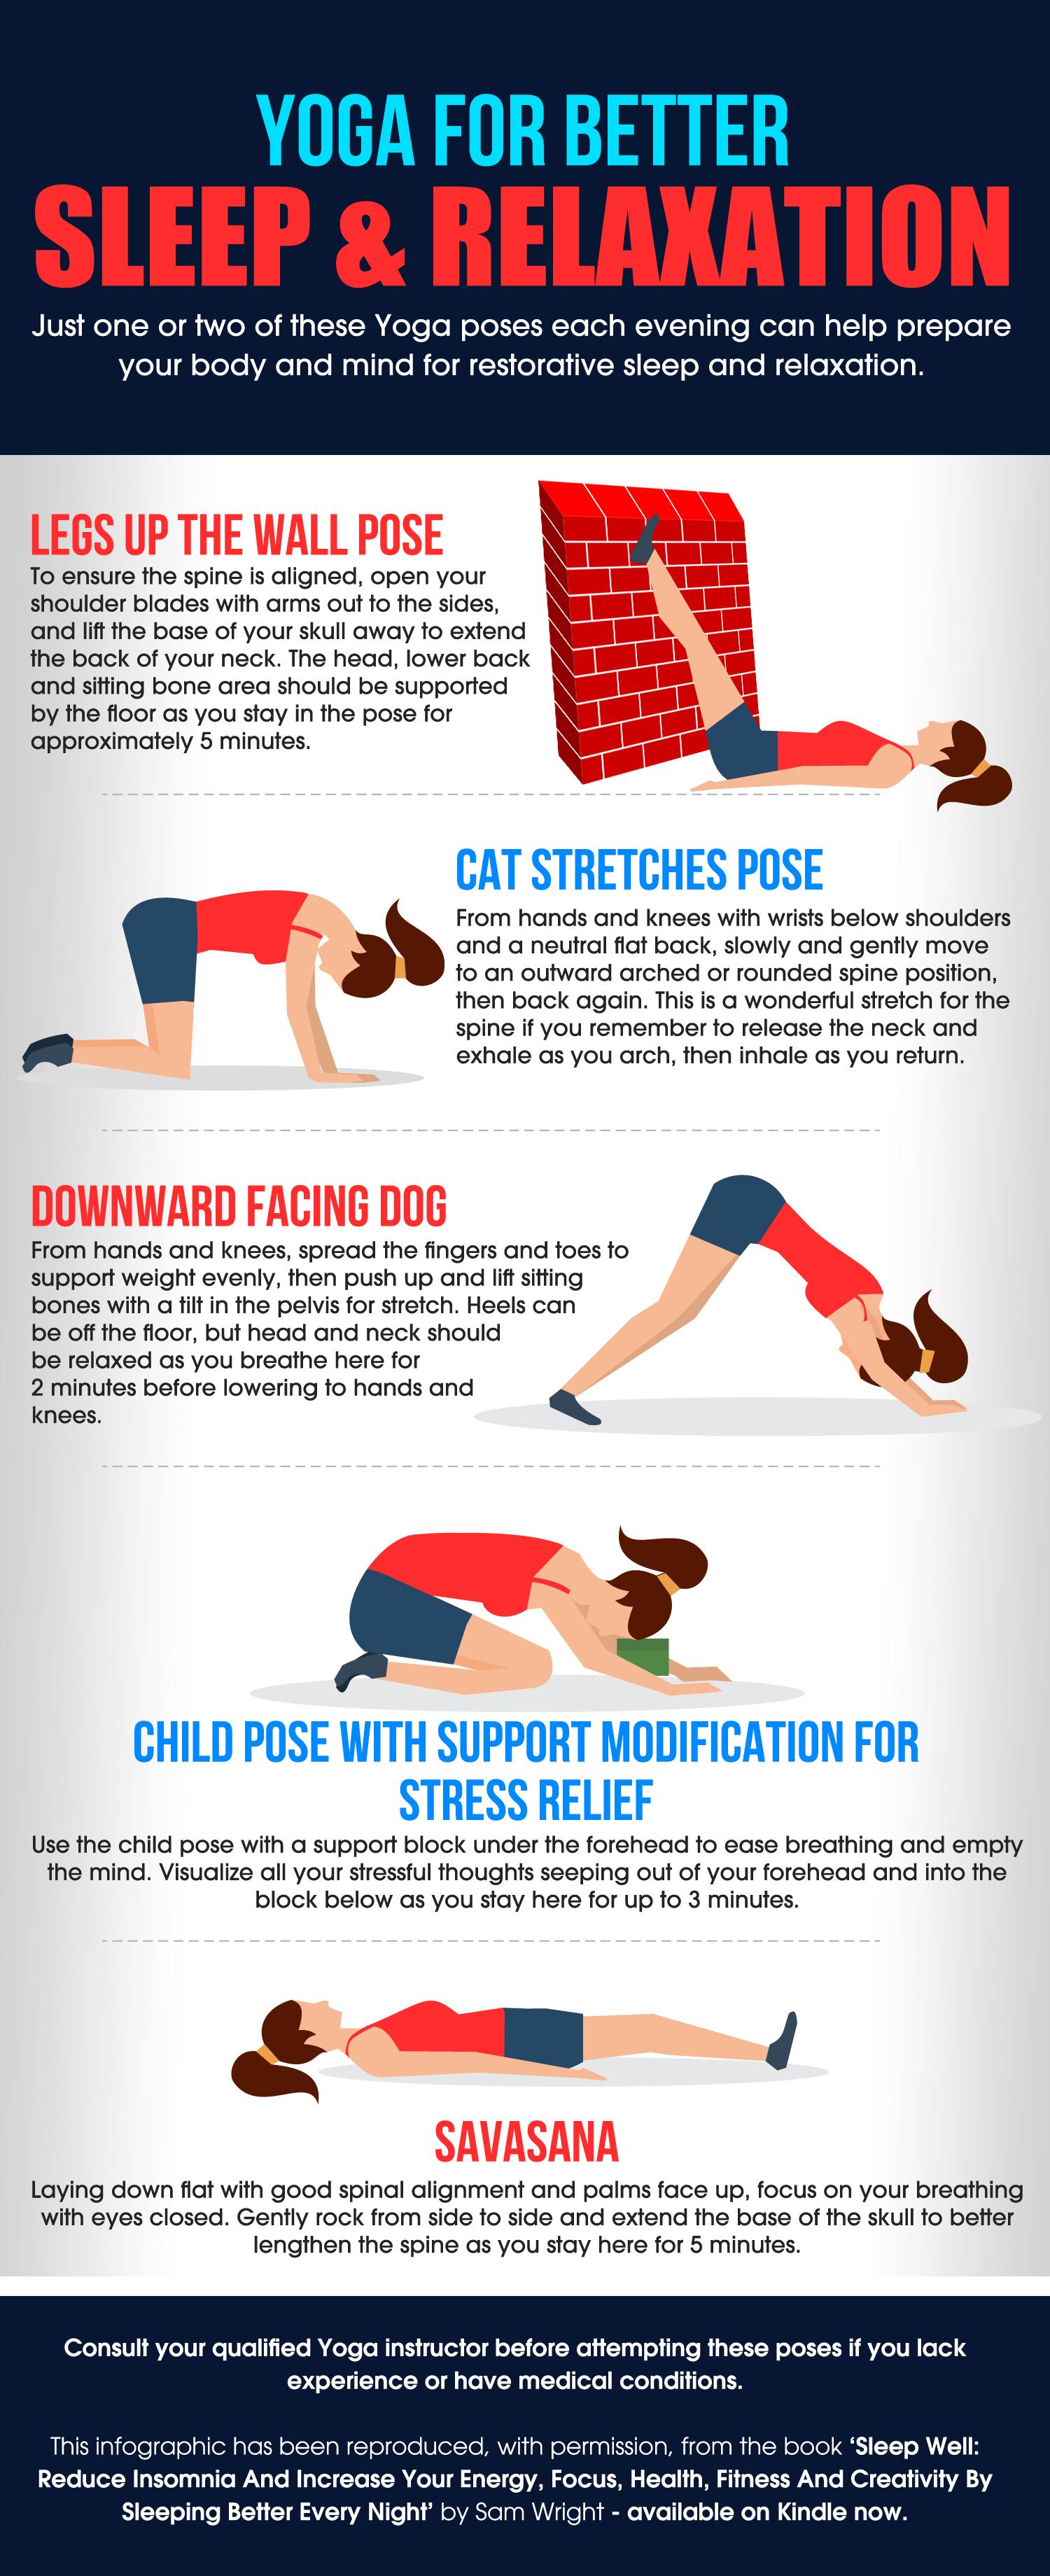 Sleep Well and alleviate Sleep Disorders with Yoga